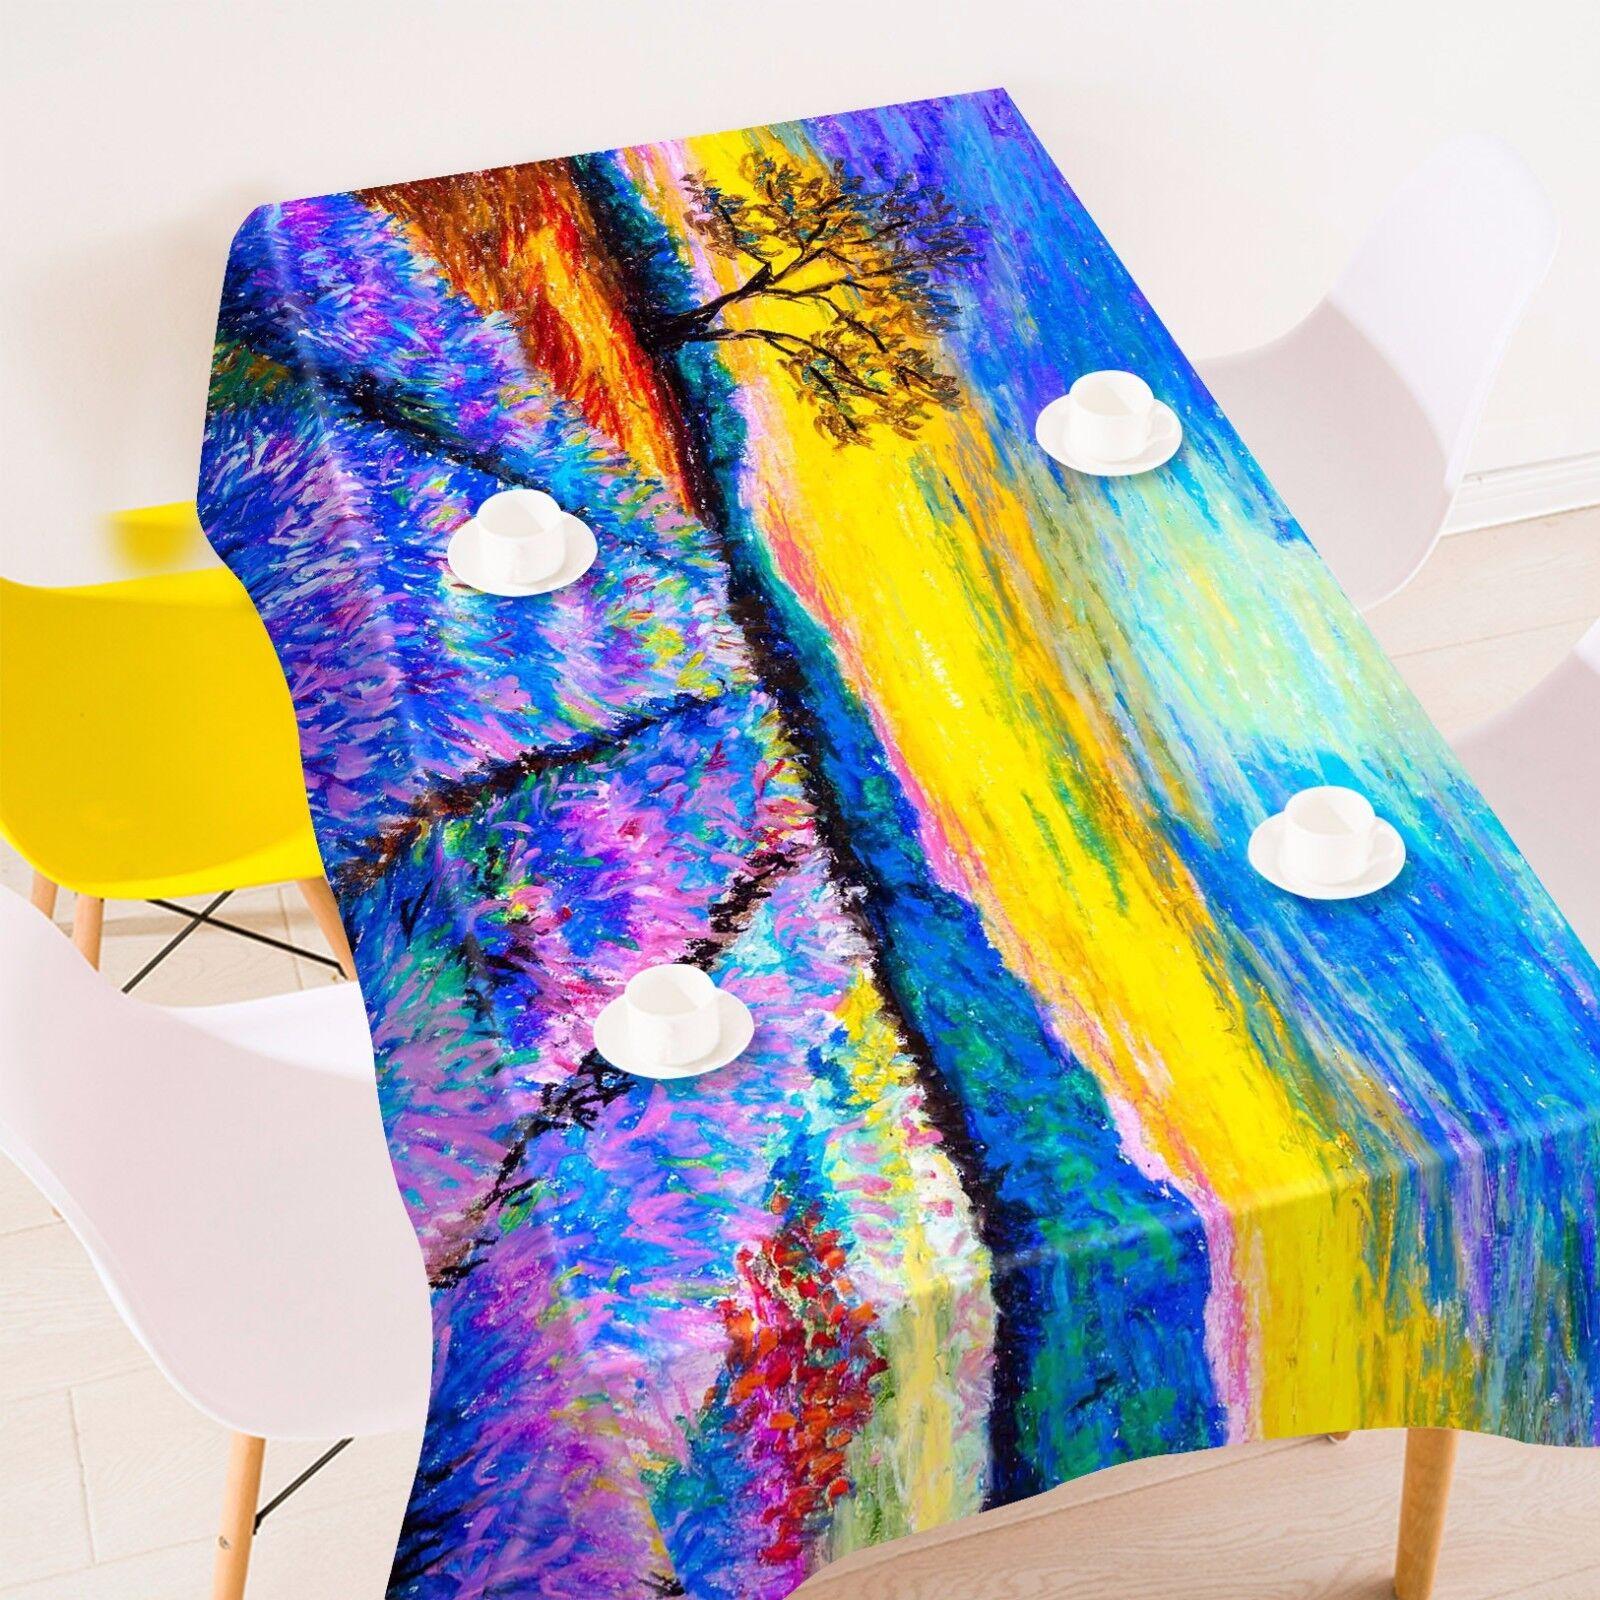 3D Paint 49 Tablecloth Table Cover Cloth Birthday Party AJ WALLPAPER UK Lemon